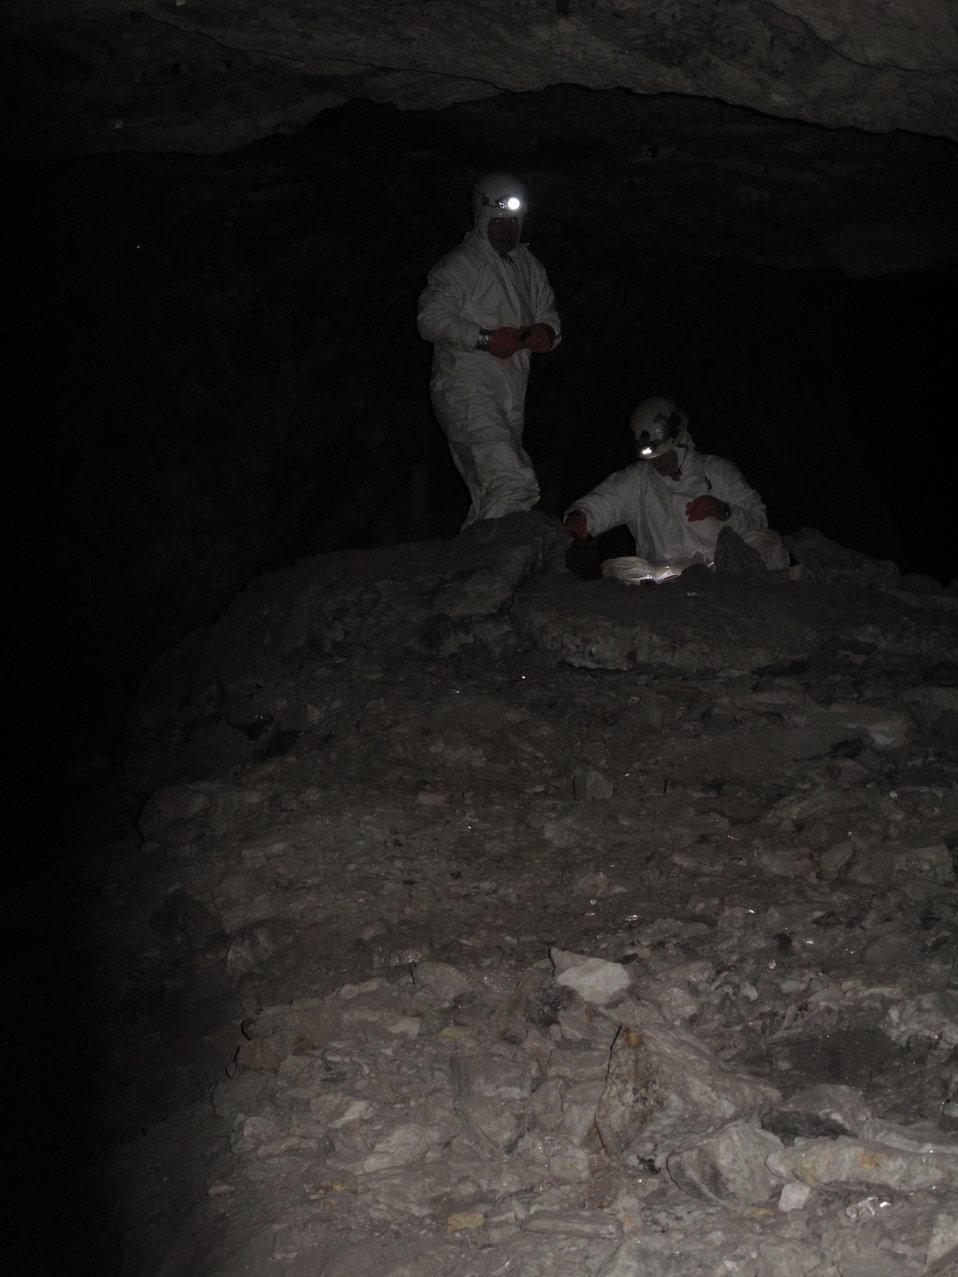 NCWRC biologists underground